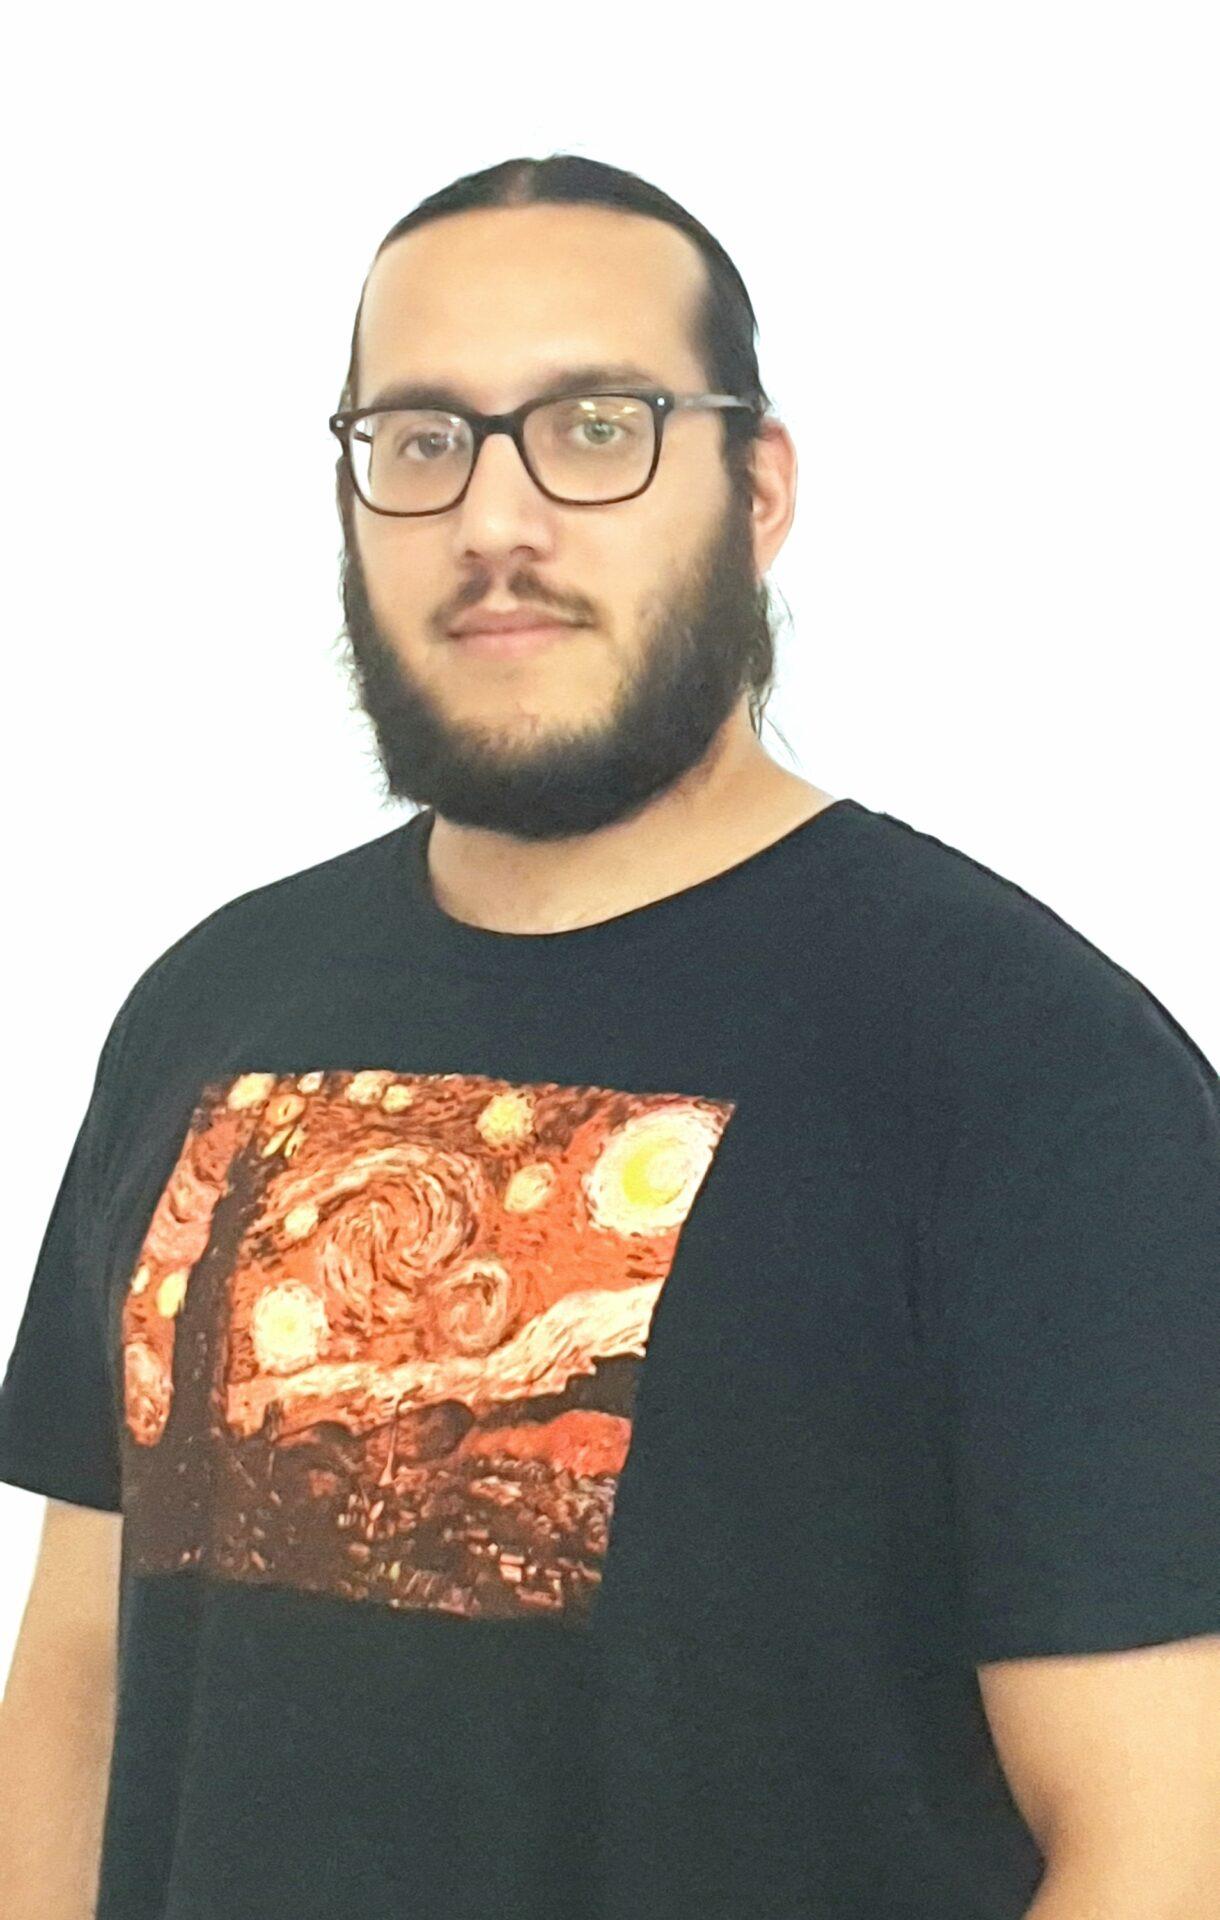 José Francisco Largaespada